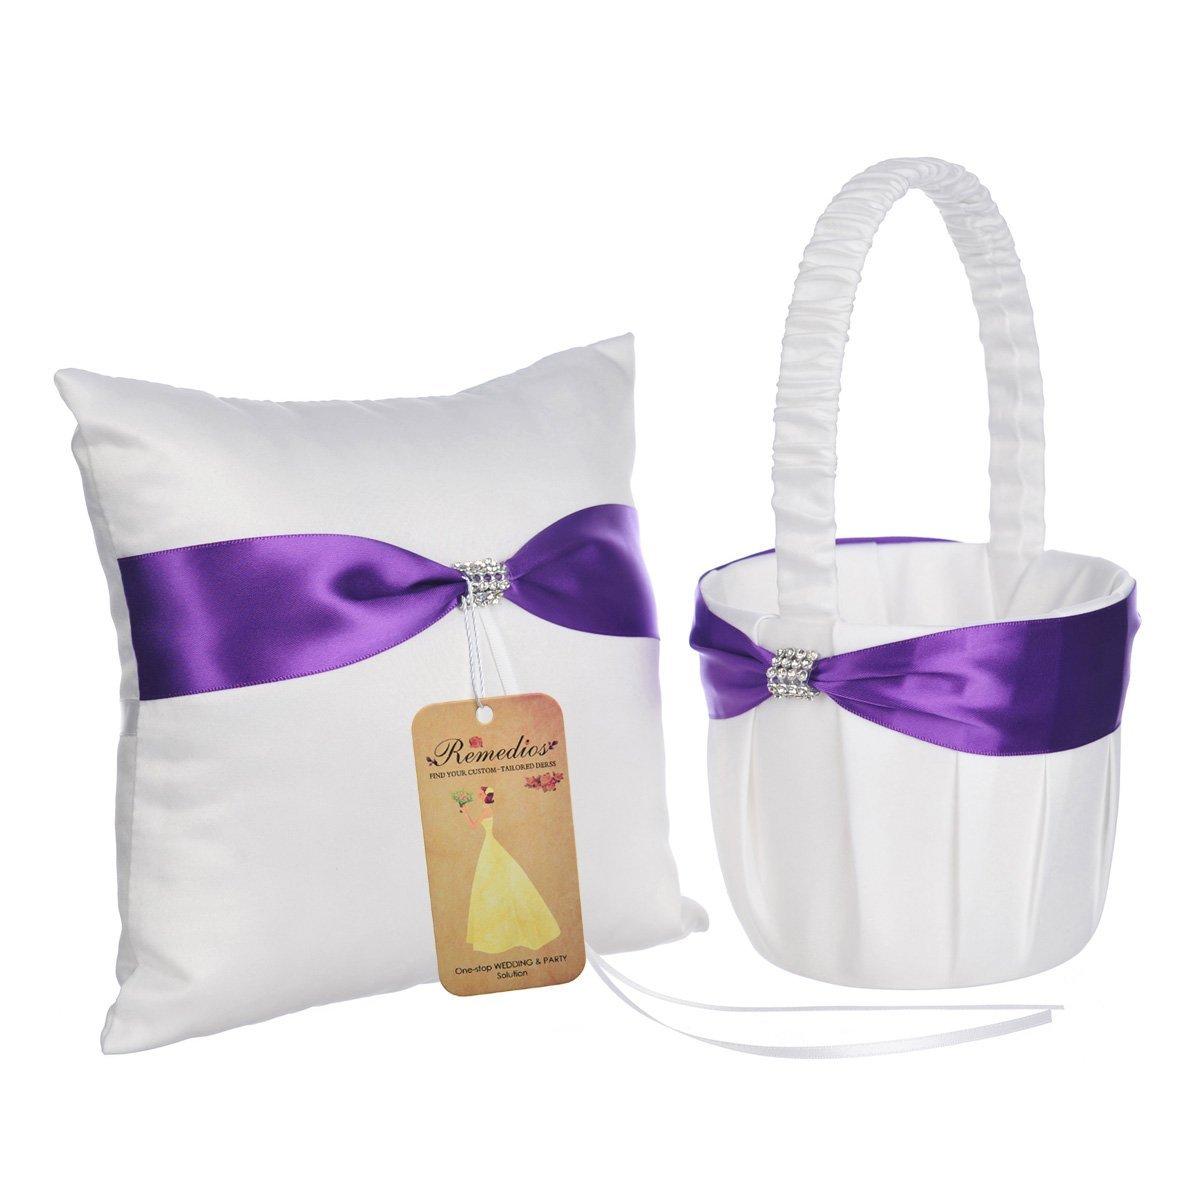 Remedios Purple Bow White Satin Wedding Ring Bearer Pillow Flower Girl Basket Set LWCAHLJZ130015